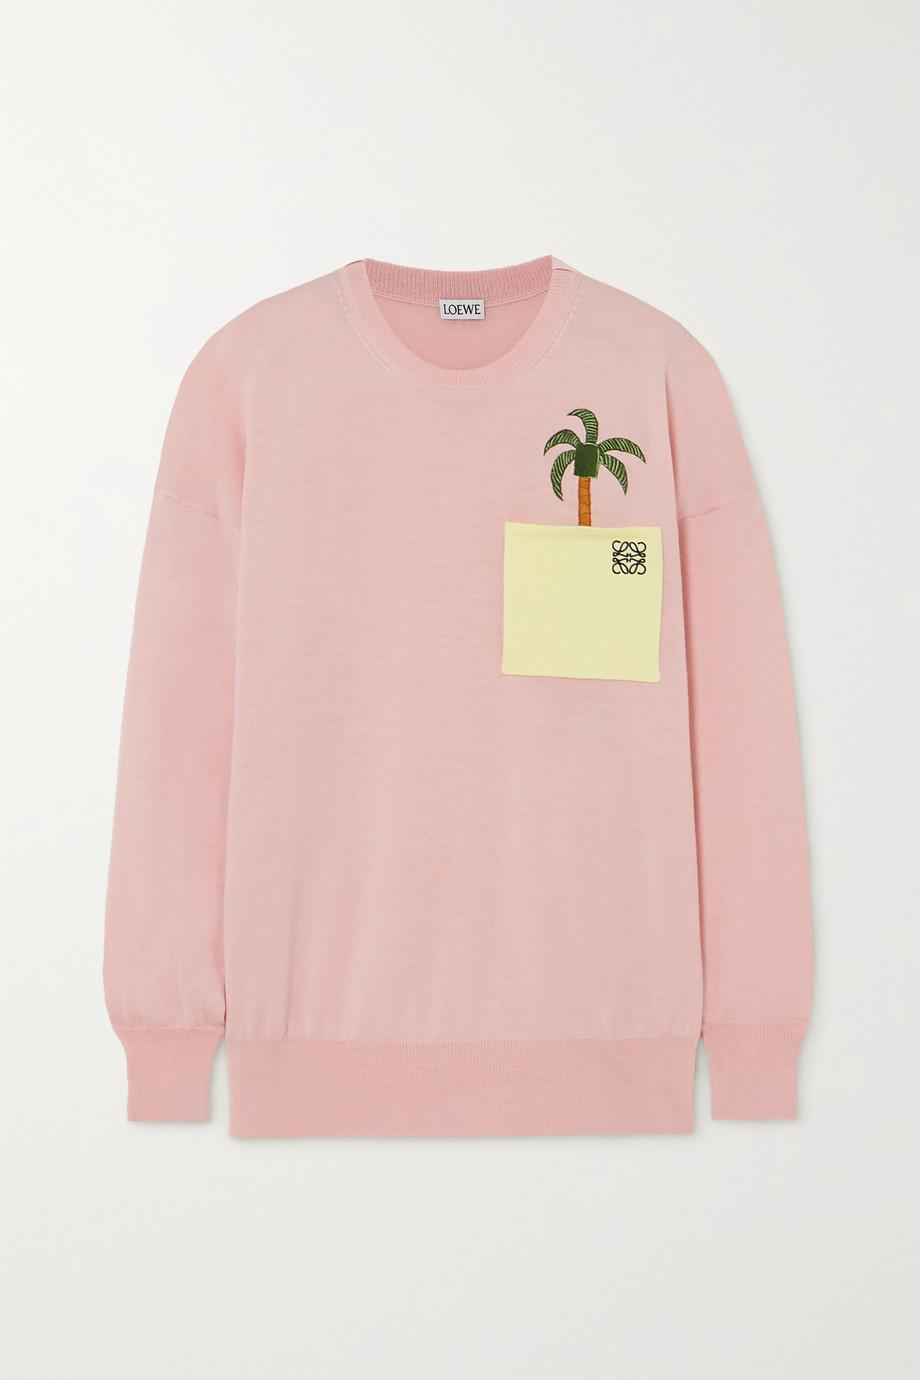 Loewe + Ken Price La Palme embroidered wool-blend sweater